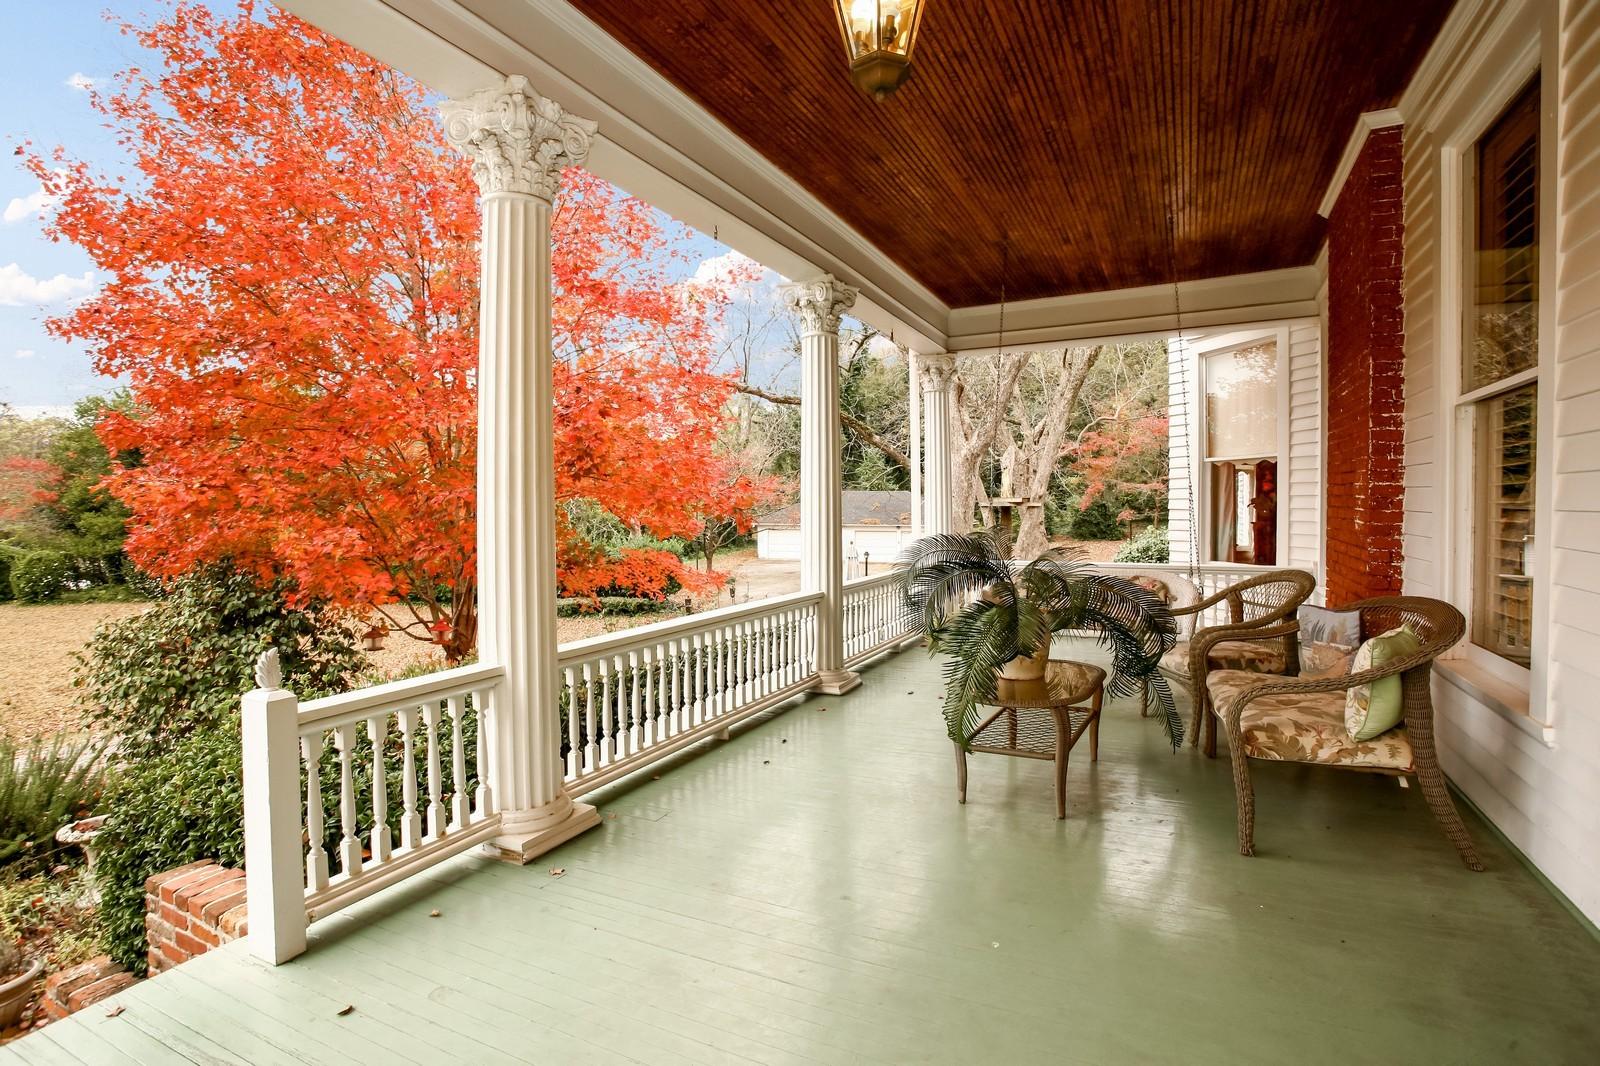 Real Estate Photography - 414 N 14th St, Lanett, AL, 36863 - Patio